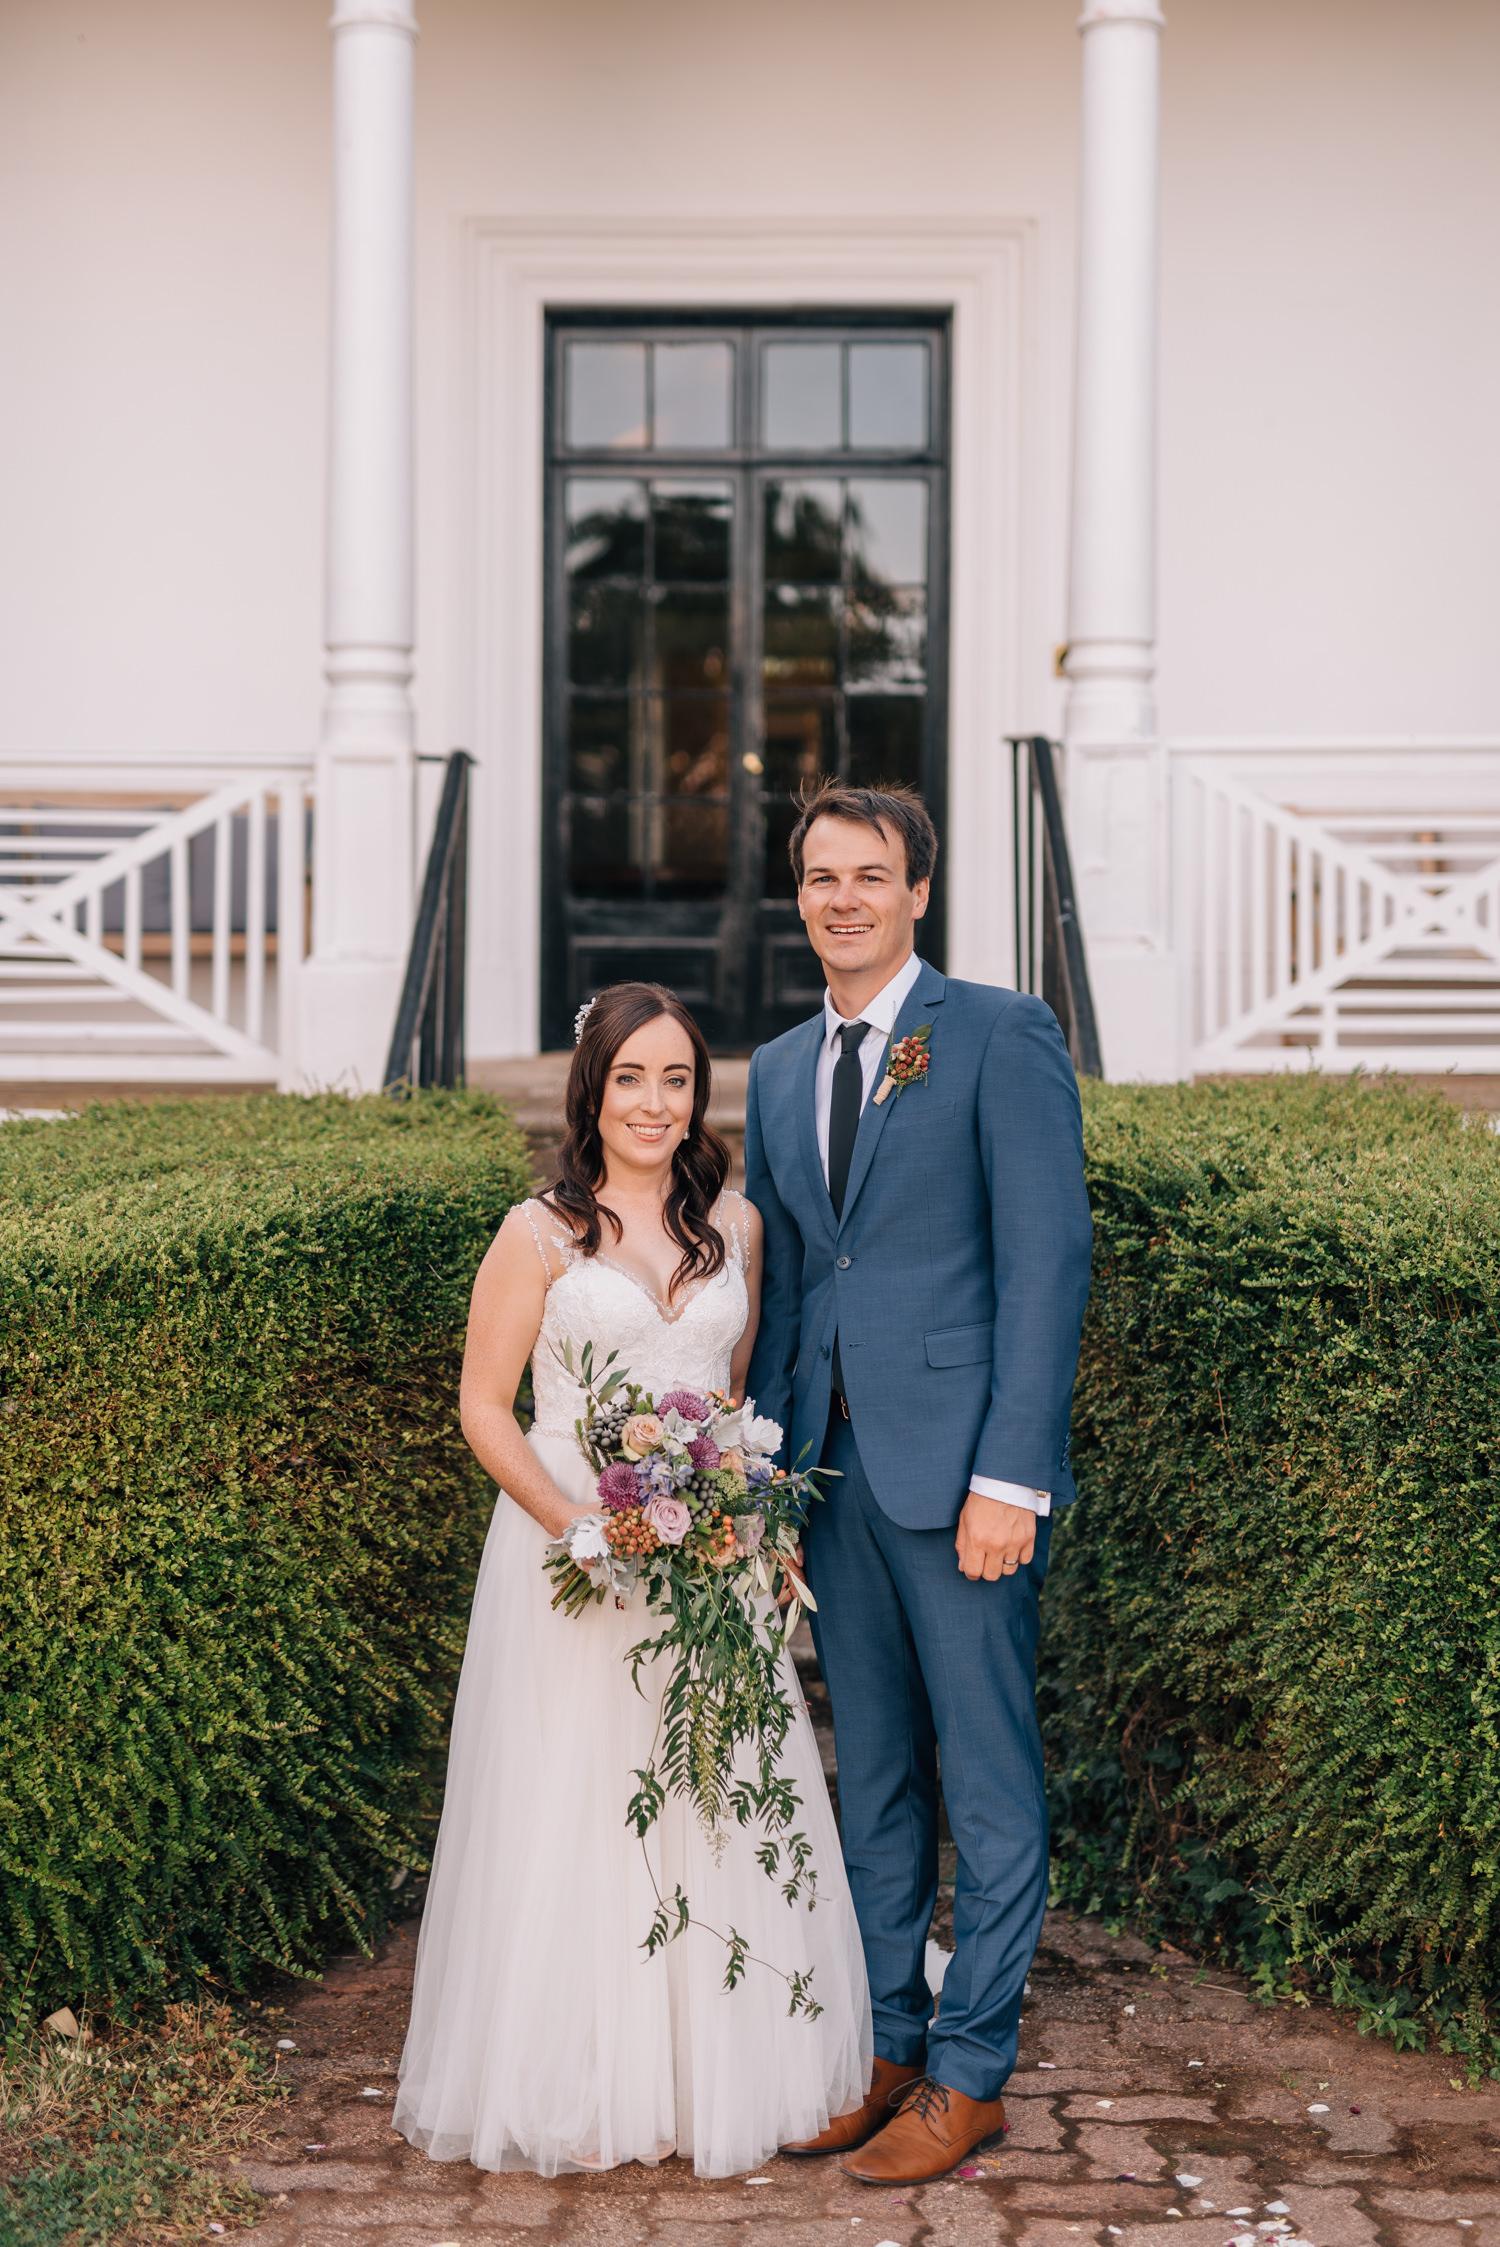 Quamby-Wedding-Photographer-118.jpg